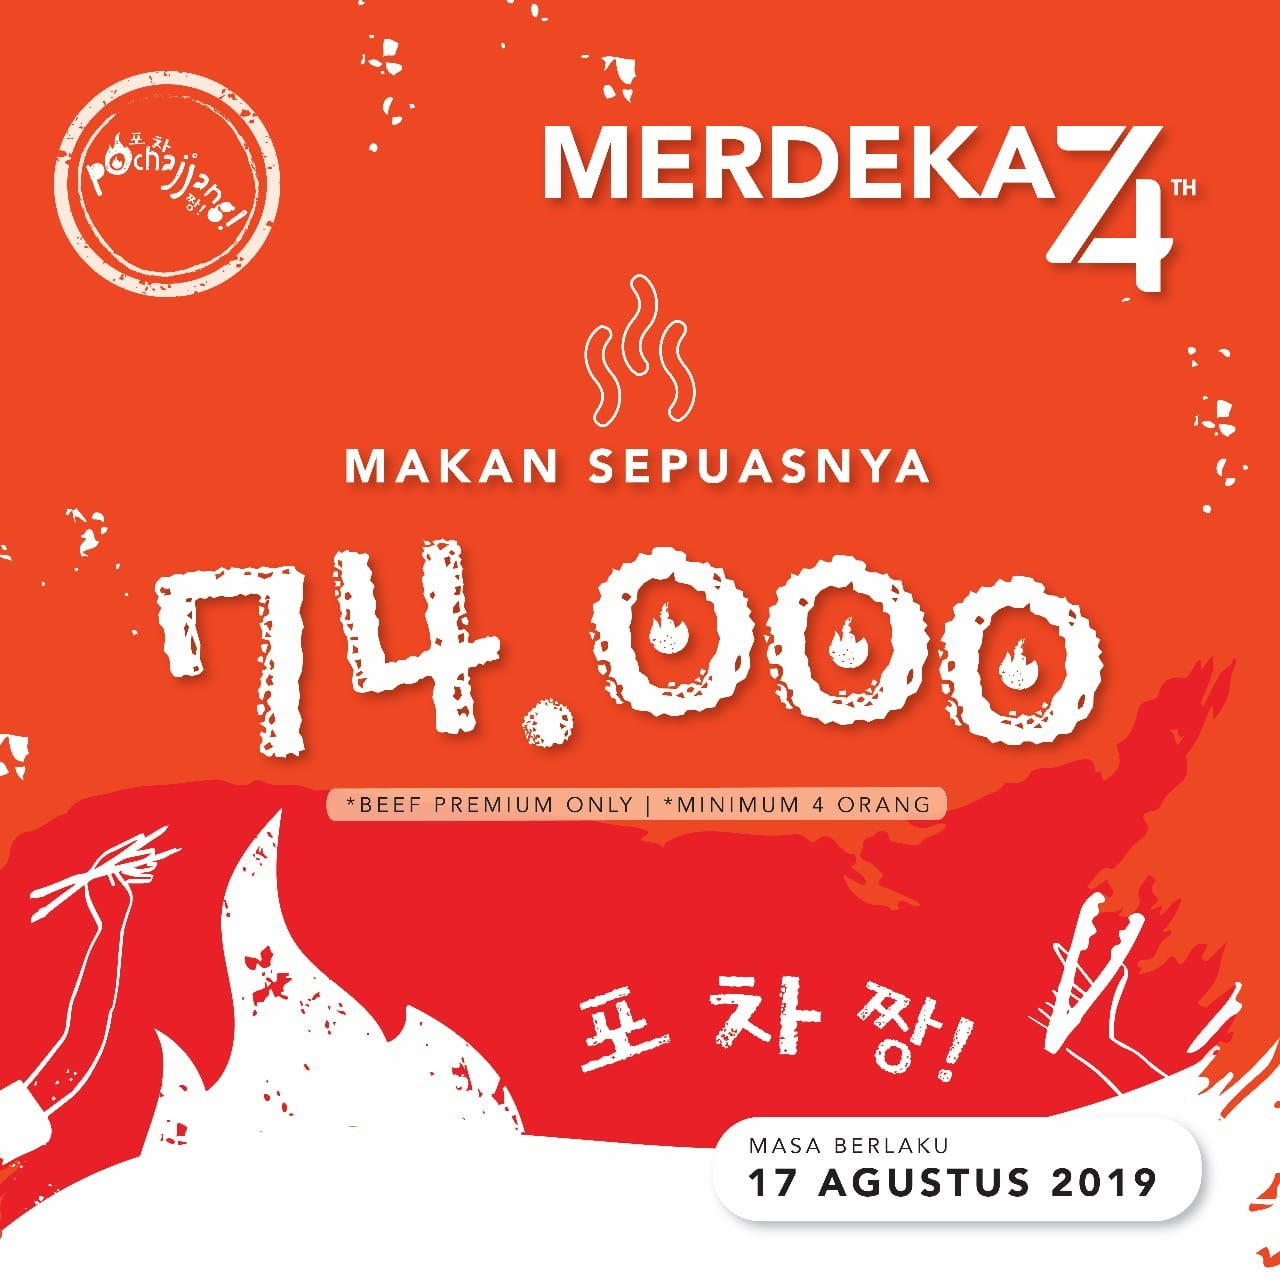 Pochajjang Korean BBQ Promo Merdeka, All You Can Eat Hanya Rp. 74.000!